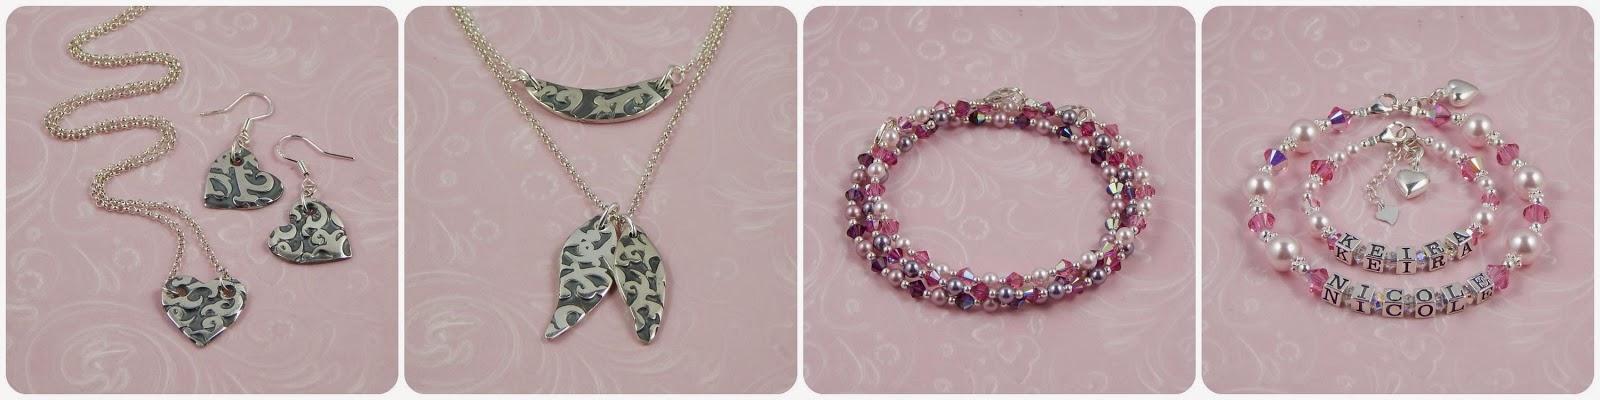 Sets jewellery range